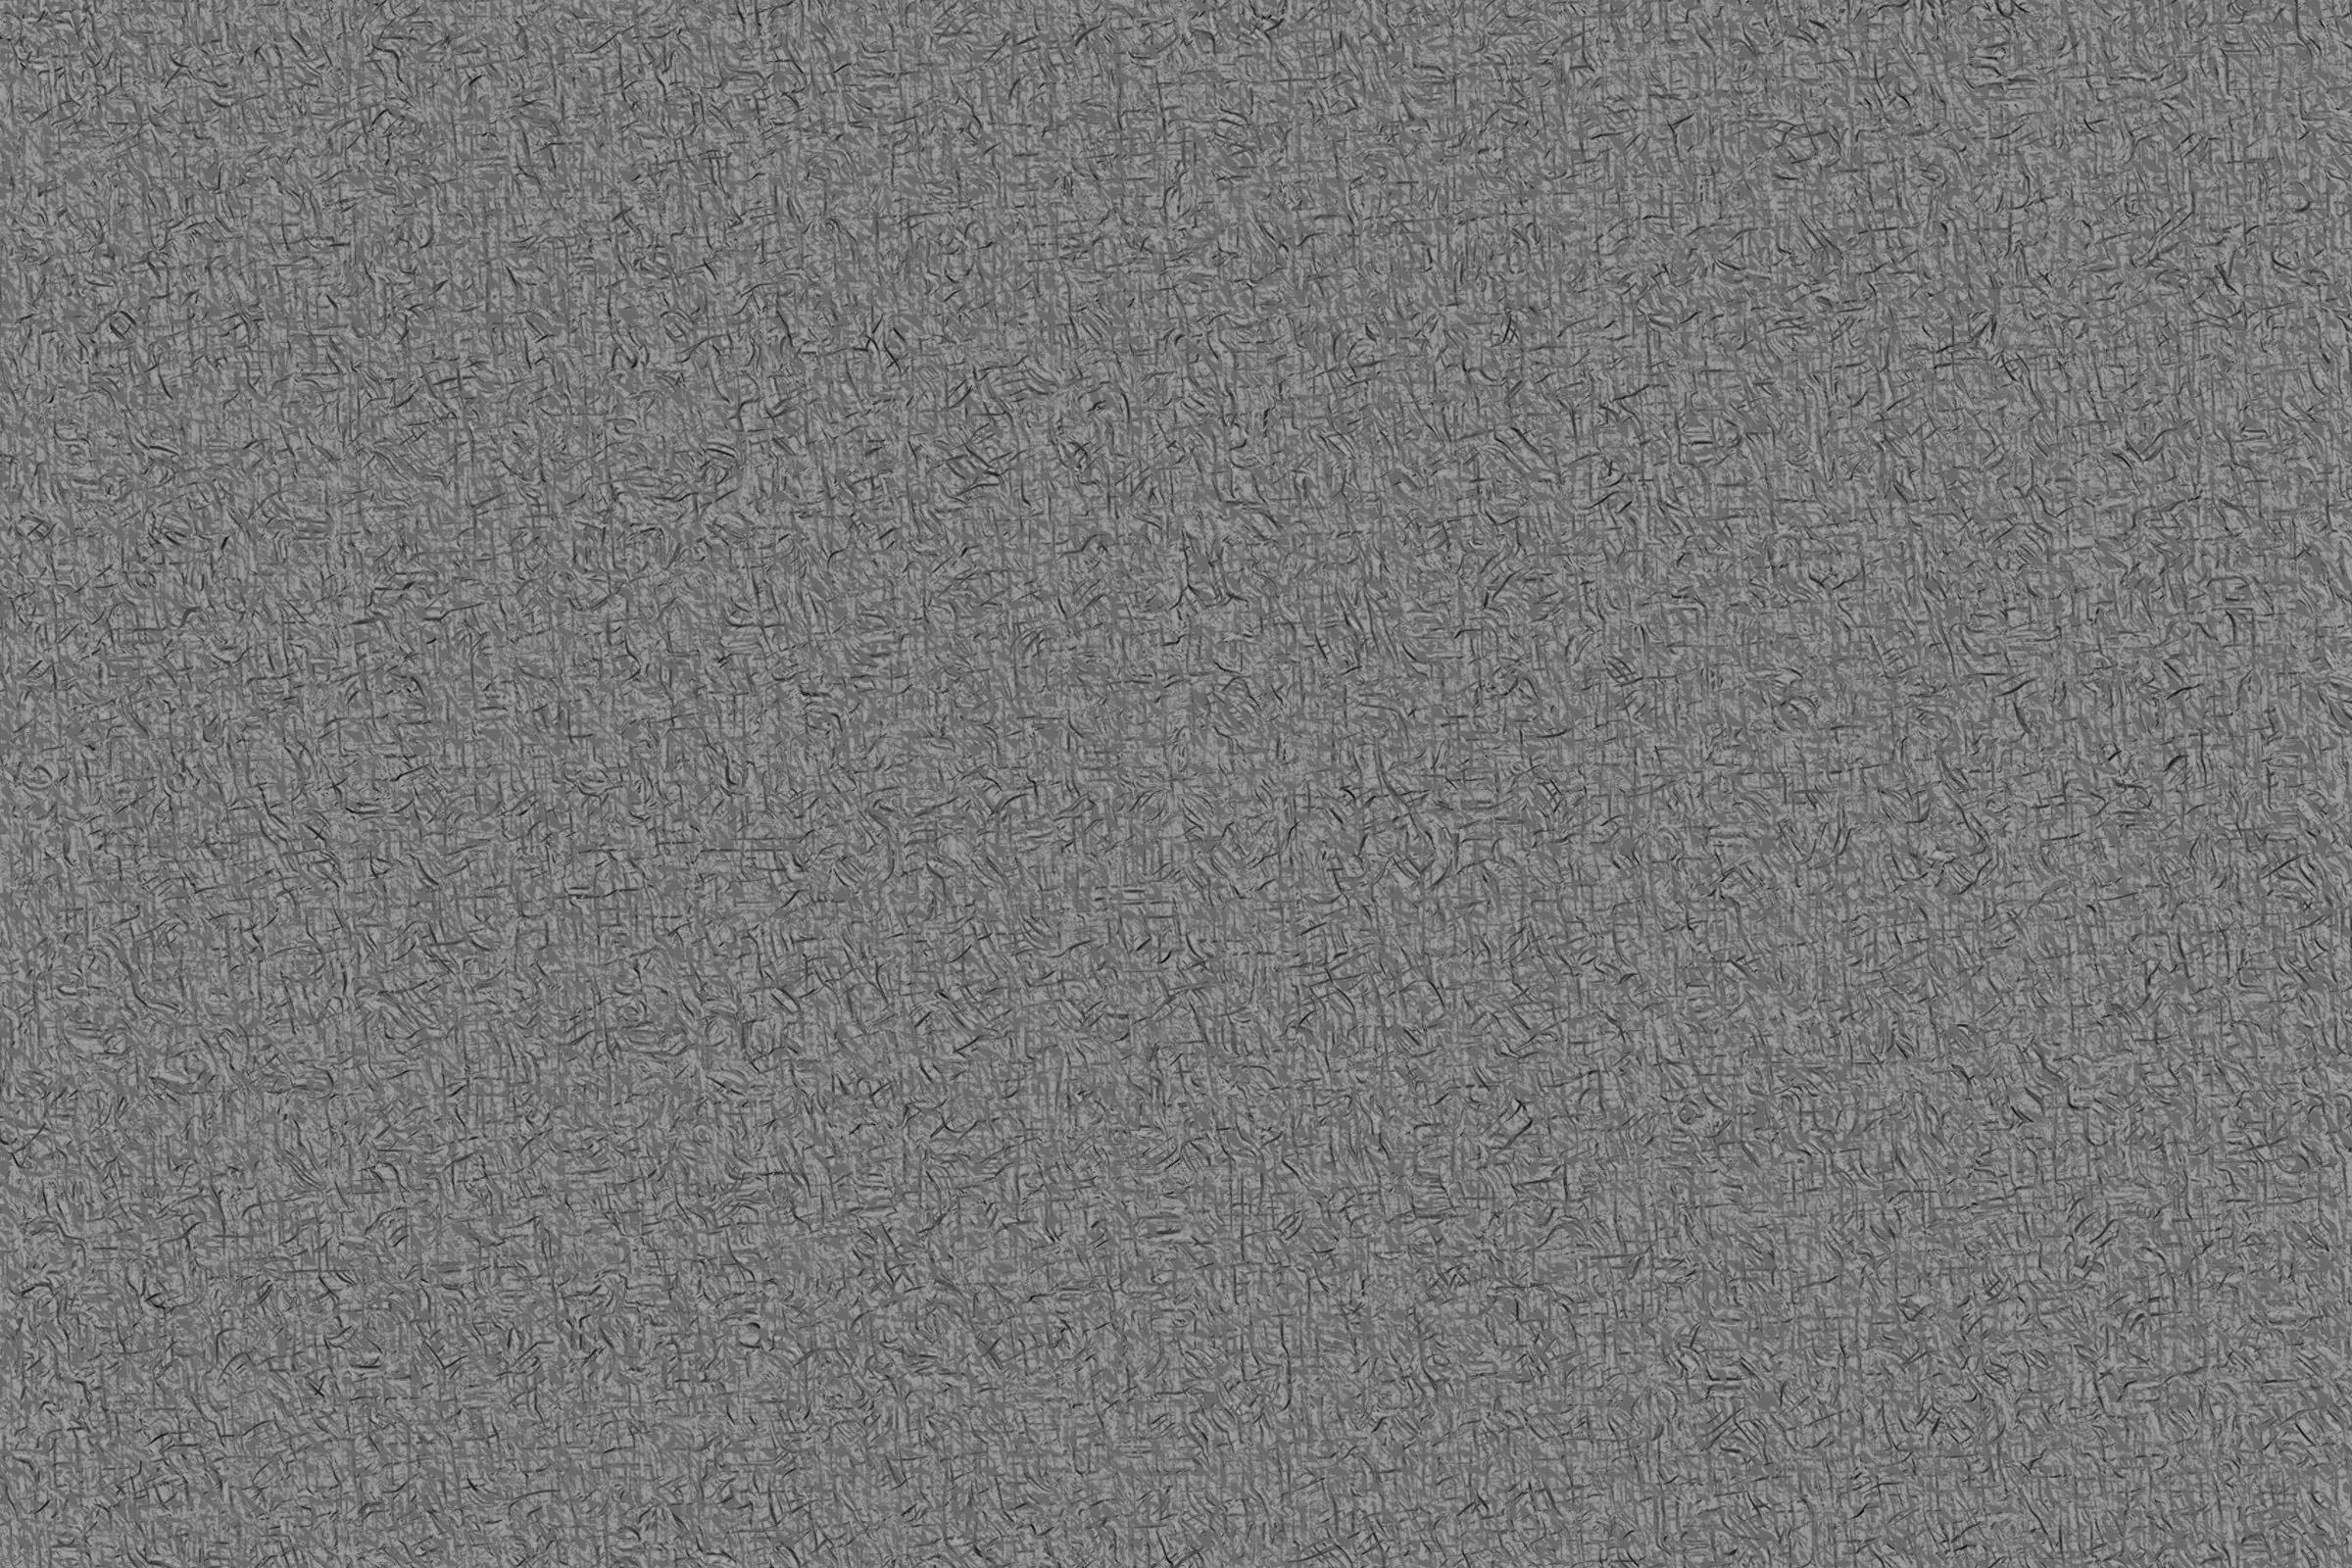 Whatsapp hintergrundbilder grau